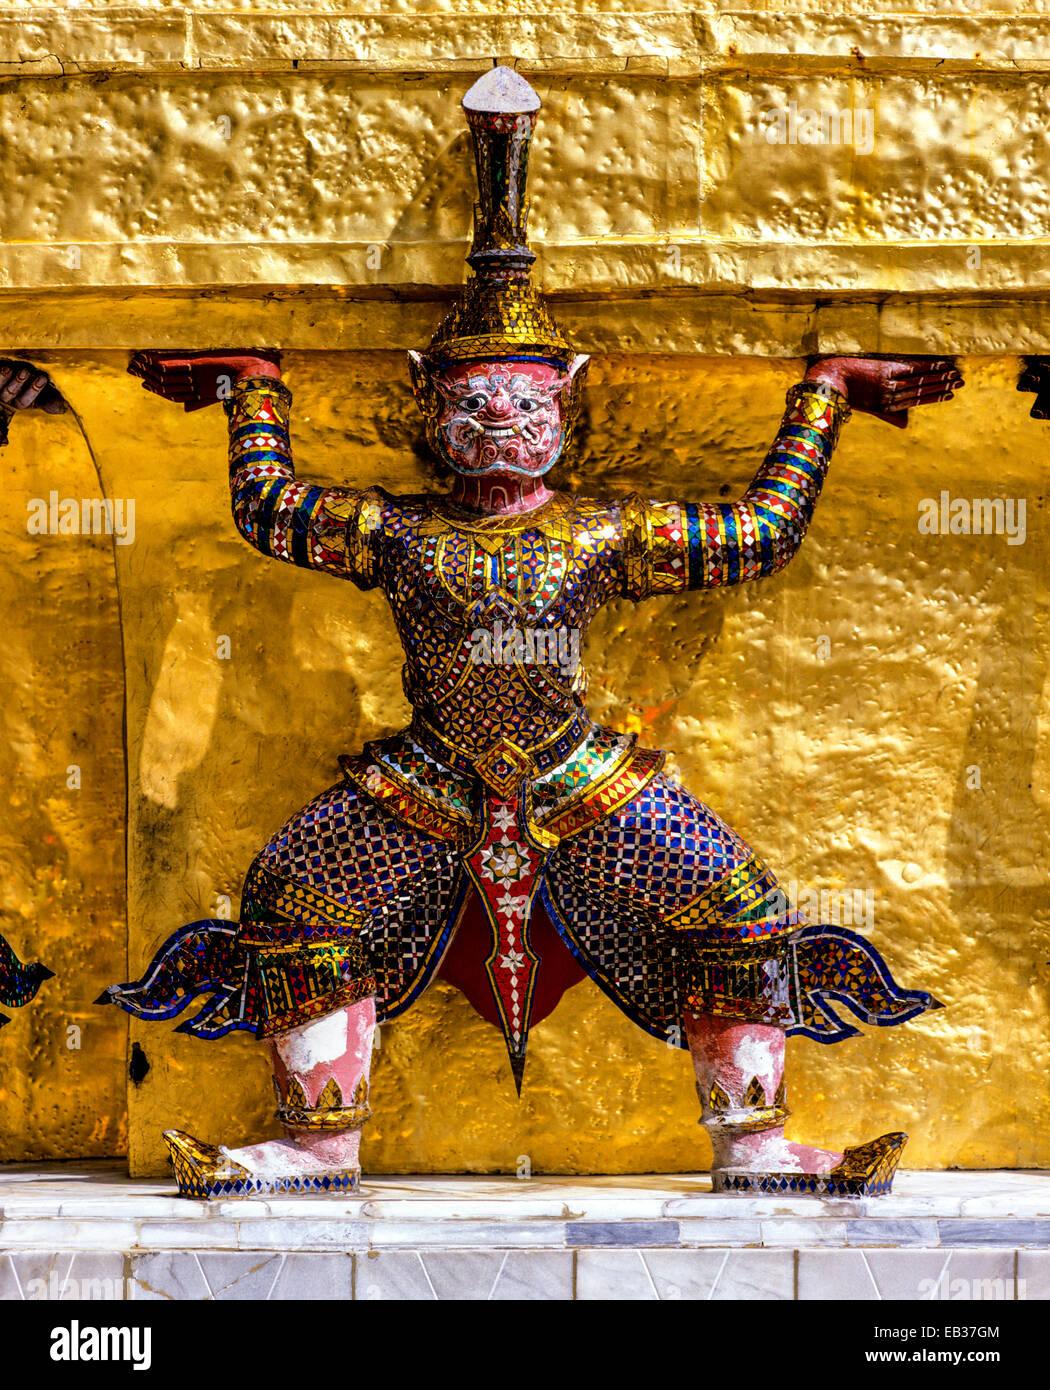 Wat Phra Kaeo Temple, Royal Palace, Caryatid demon on a golden chedi, Bangkok, Central Thailand, Thailand - Stock Image